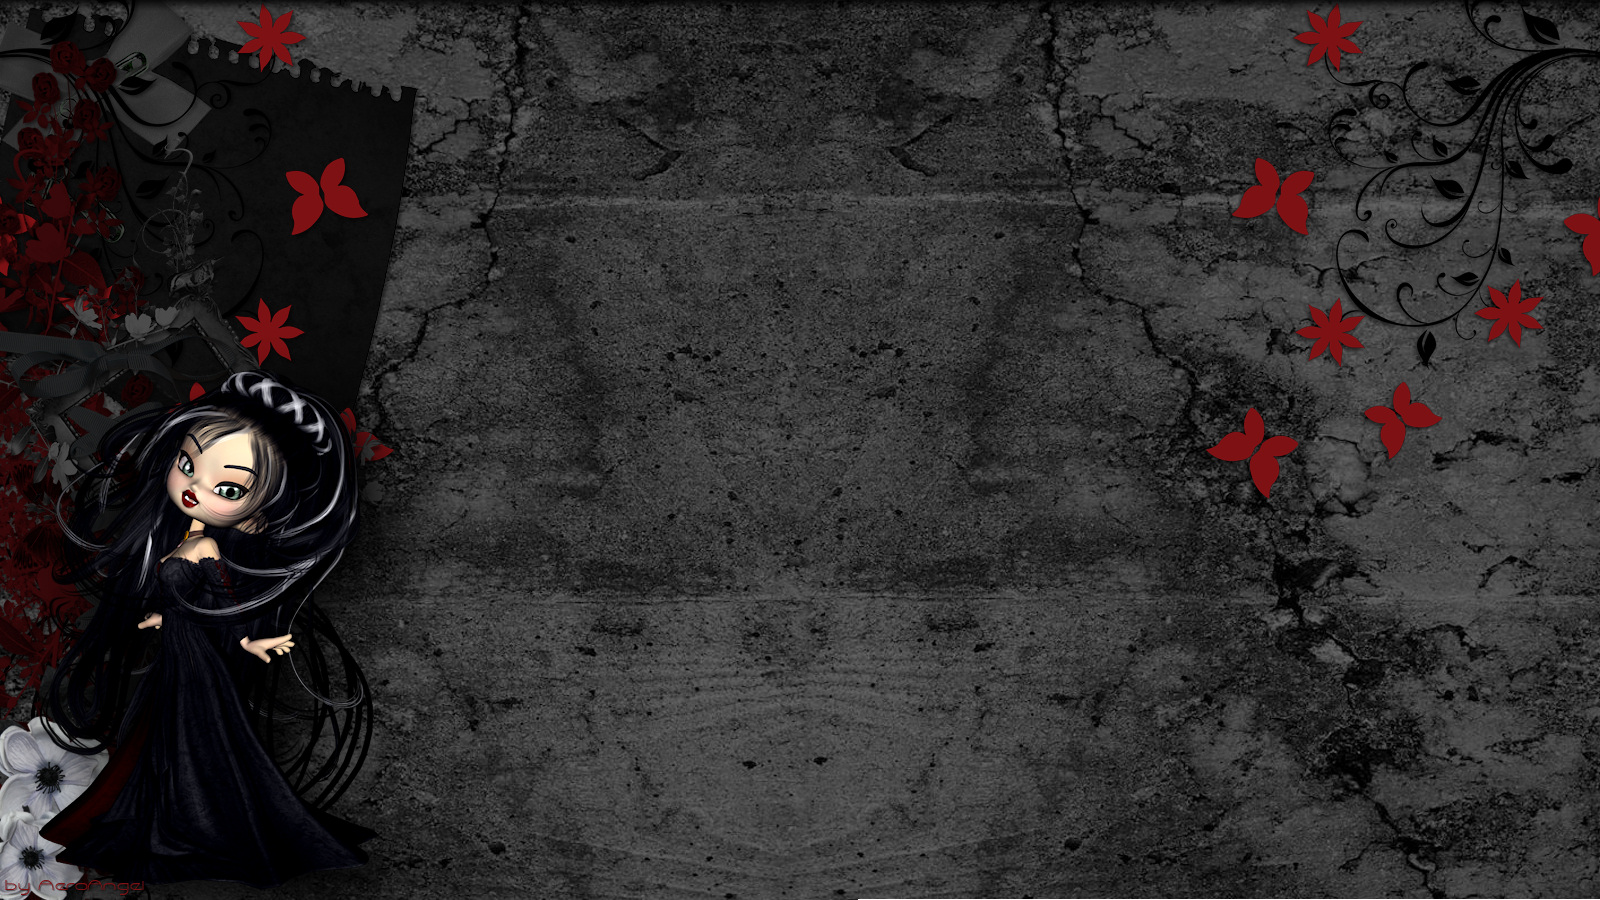 Little Goth Girl Twitter Backgrounds Little Goth Girl Twitter Themes 1600x900